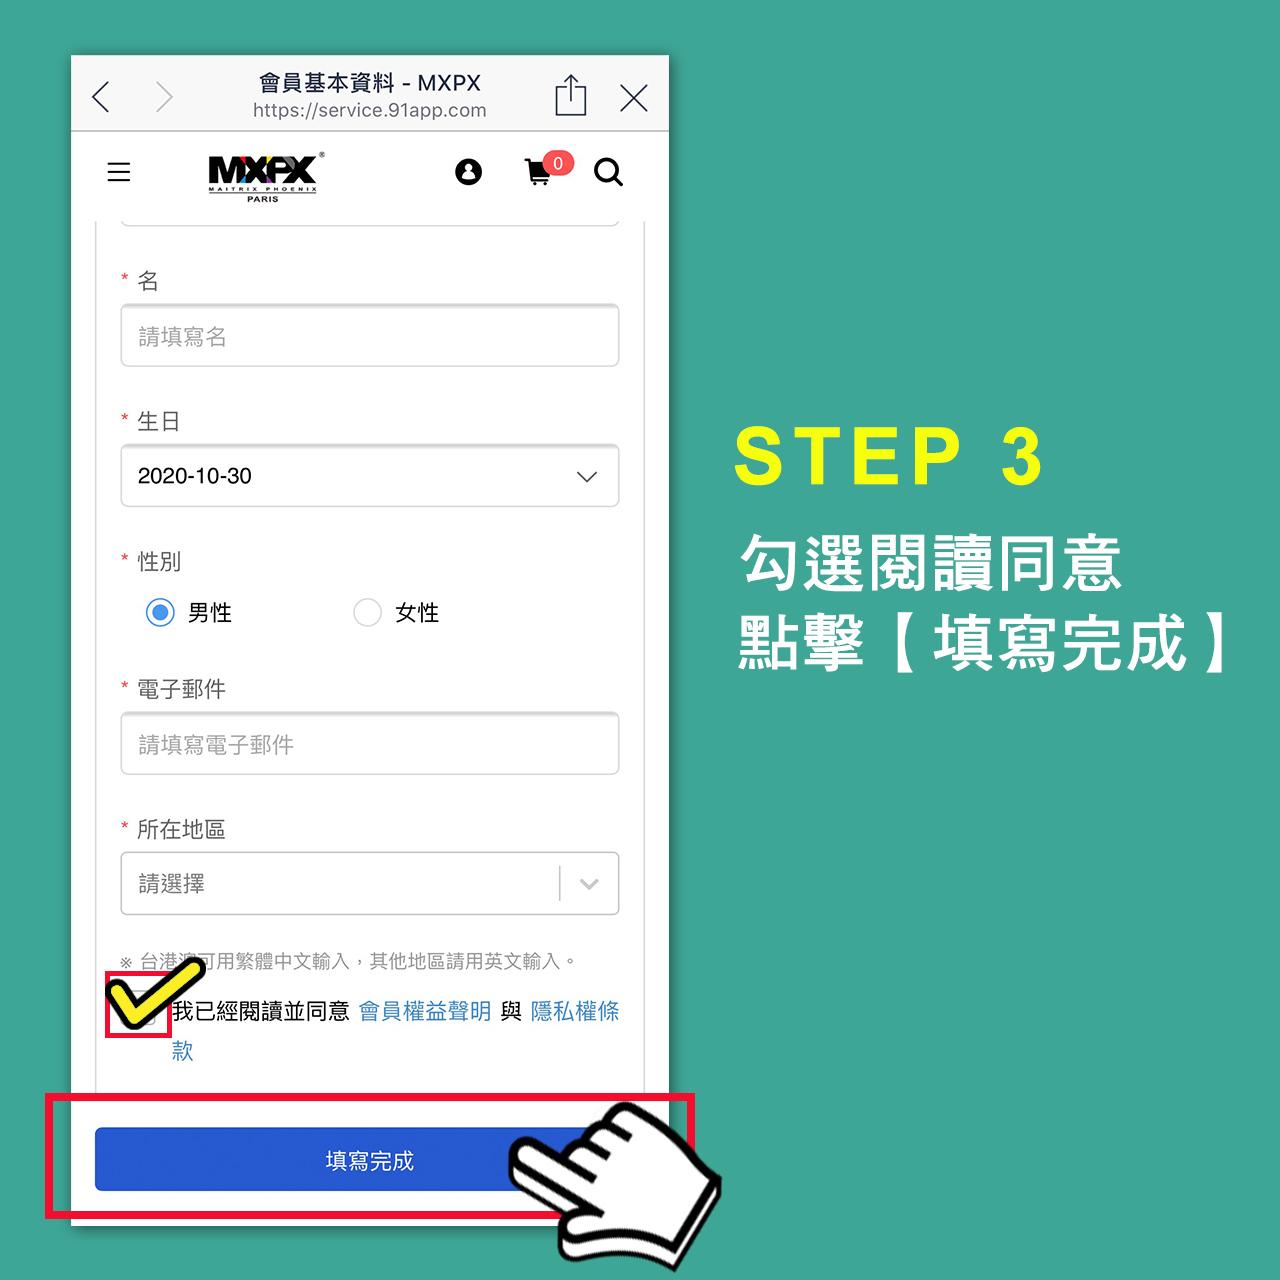 STEP 3-1